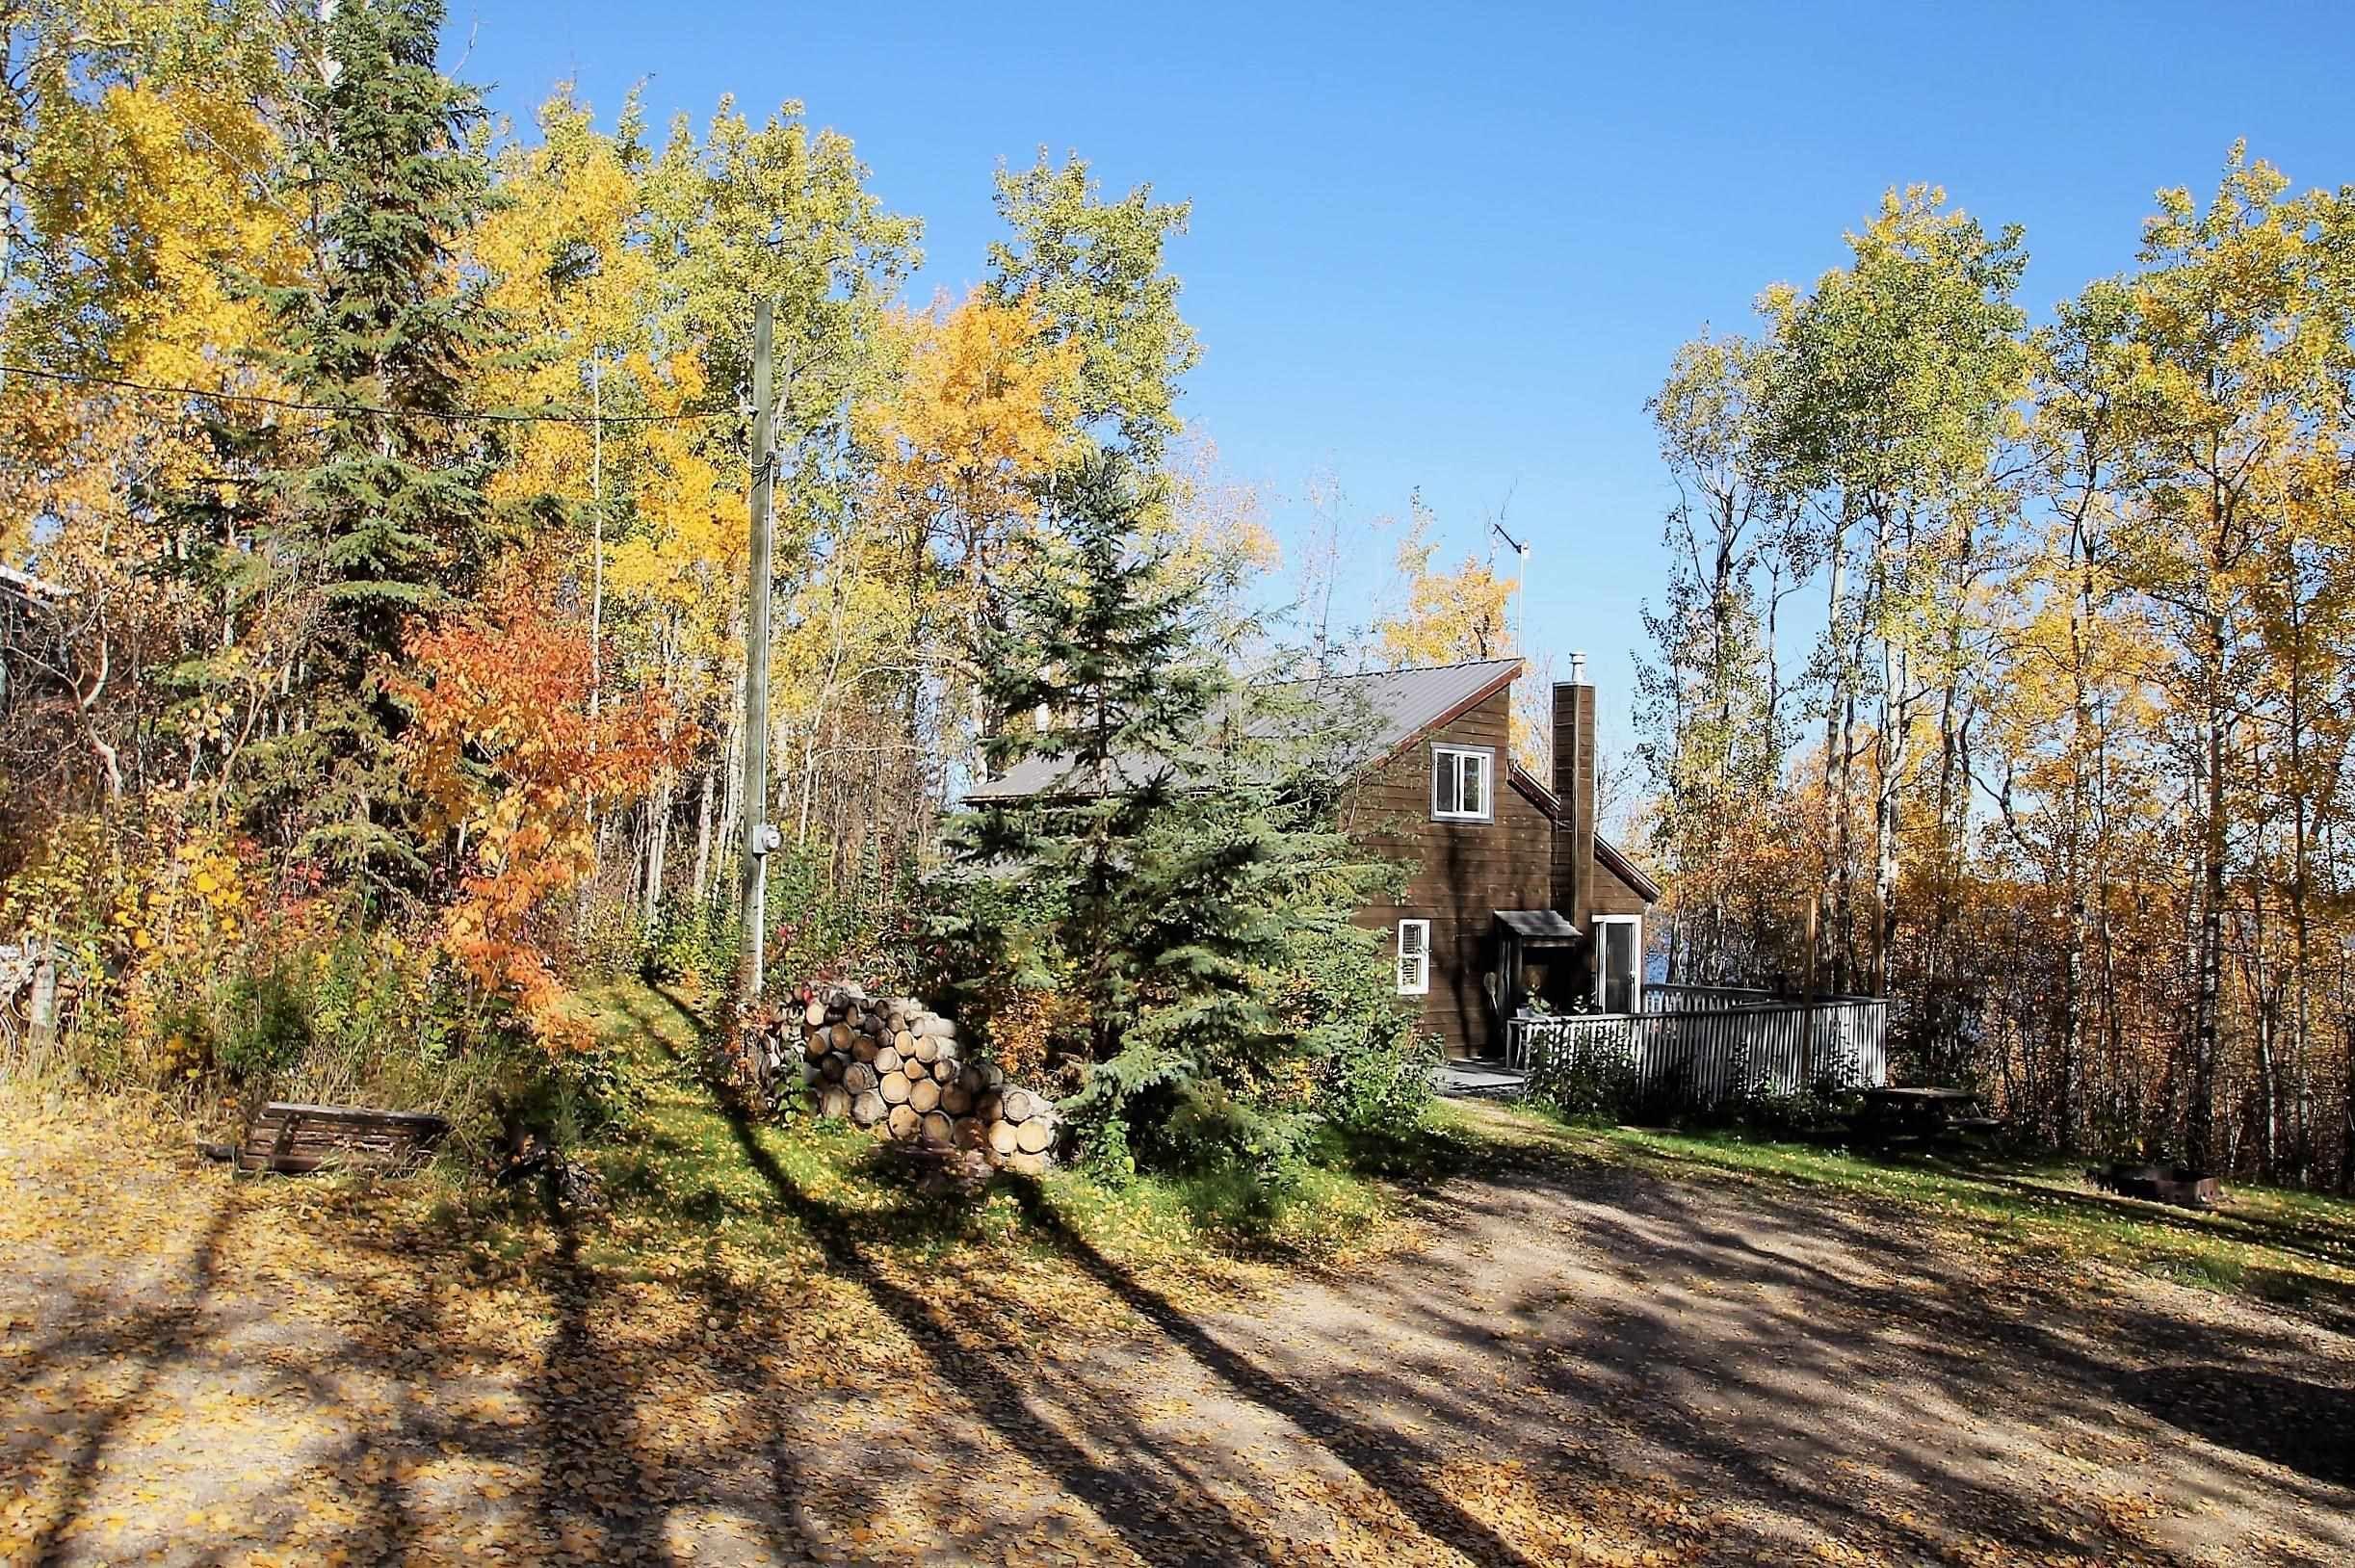 Main Photo: 646 59201 Rg Rd 95: Rural St. Paul County House for sale : MLS®# E4264960